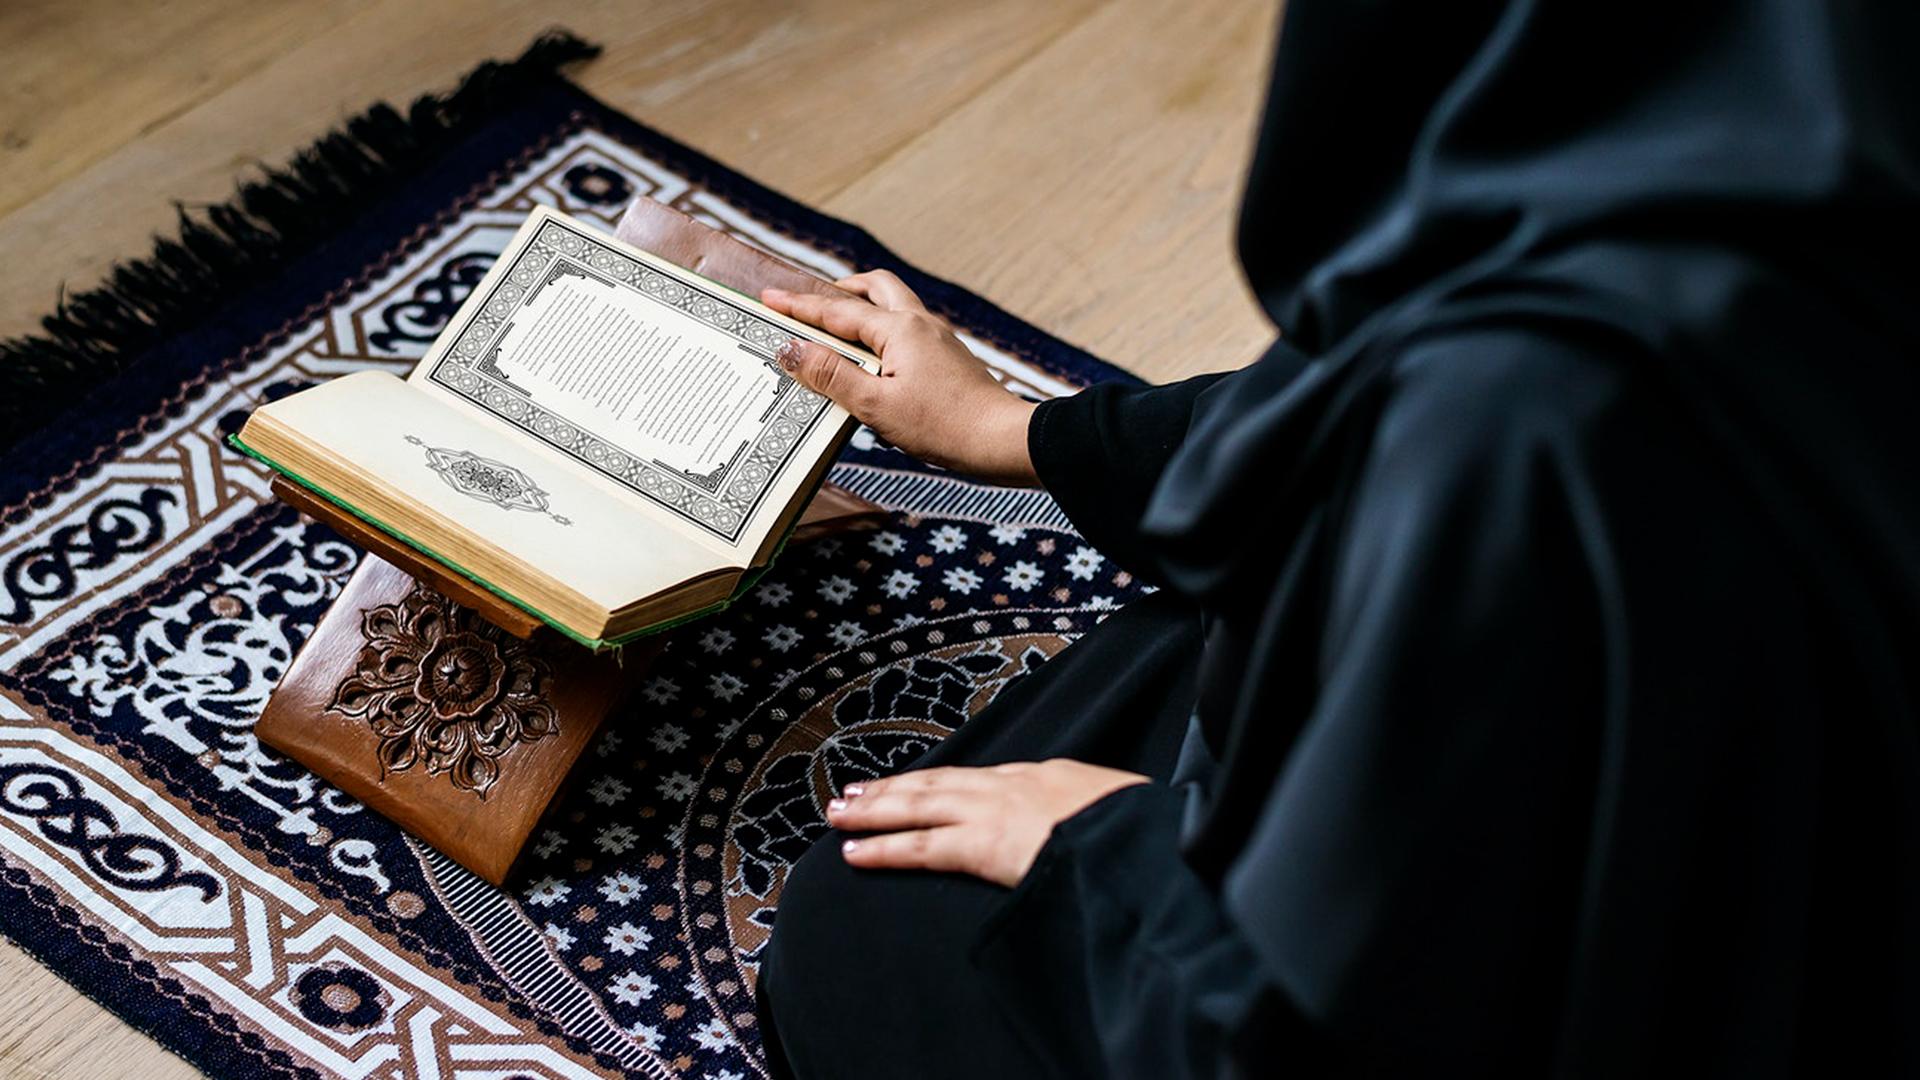 Bina-Qurani-Doa-Selesai-Sholat-From-Masjid